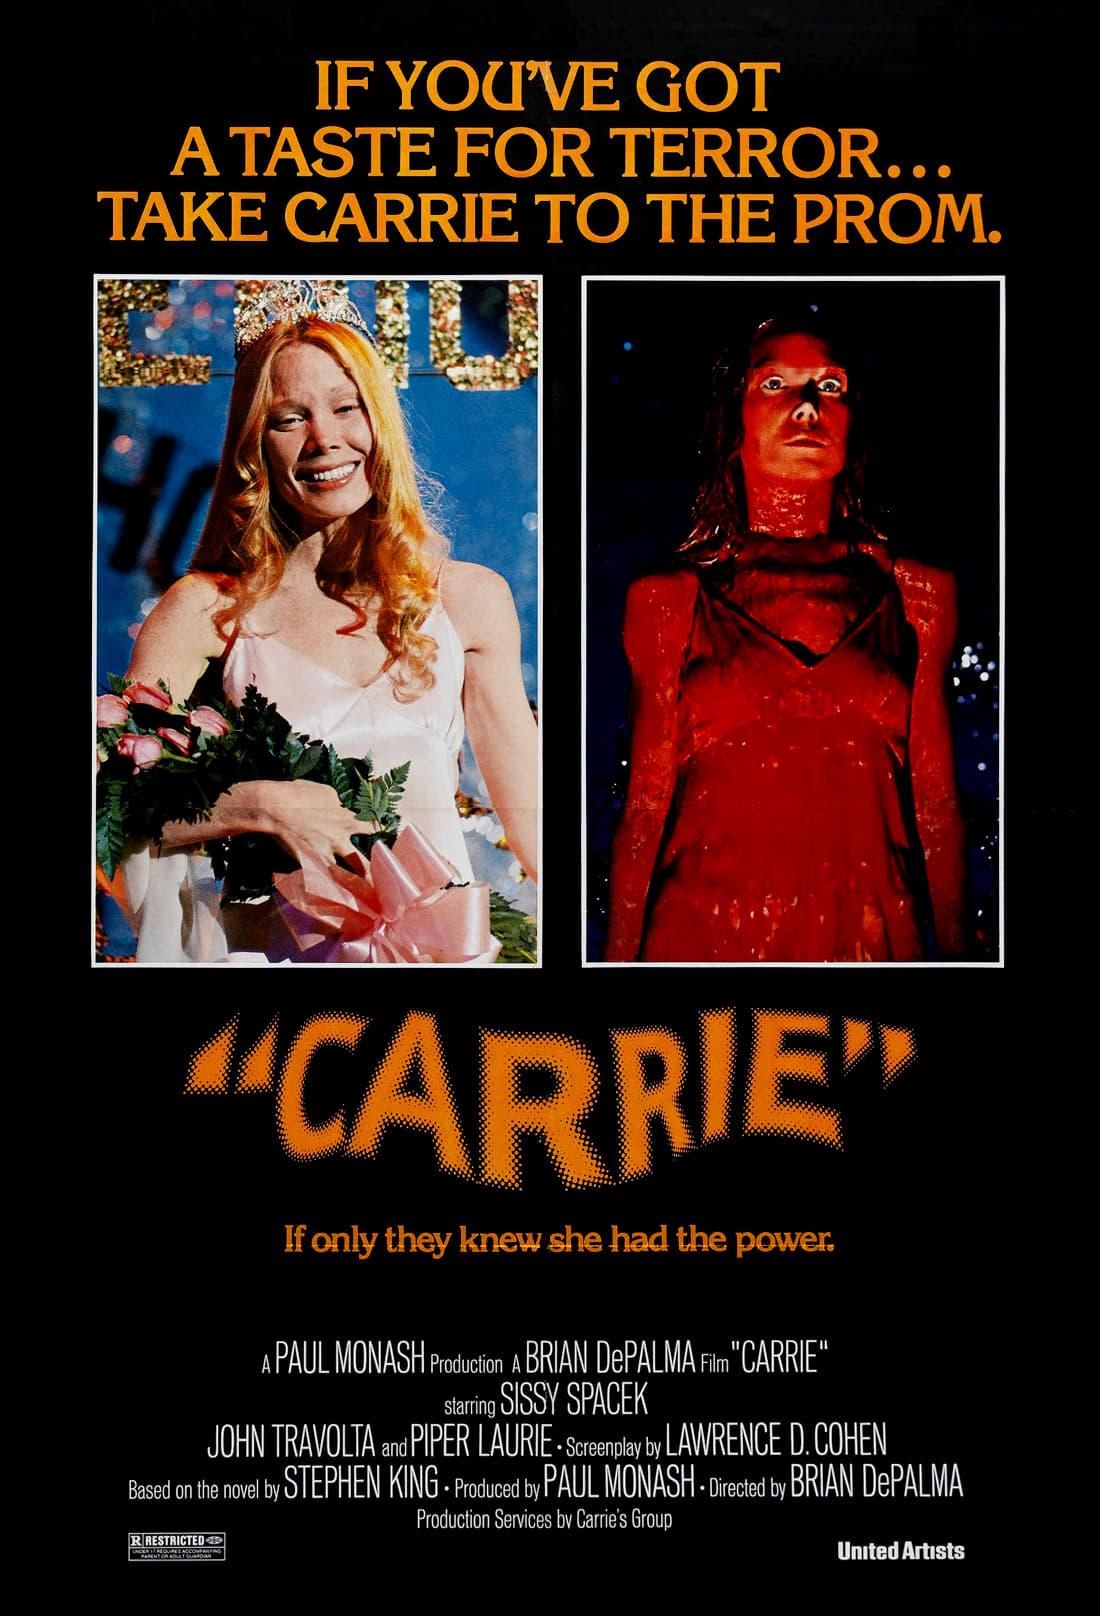 Carrie (1976 Film) | Stephen King Wiki | FANDOM powered by Wikia